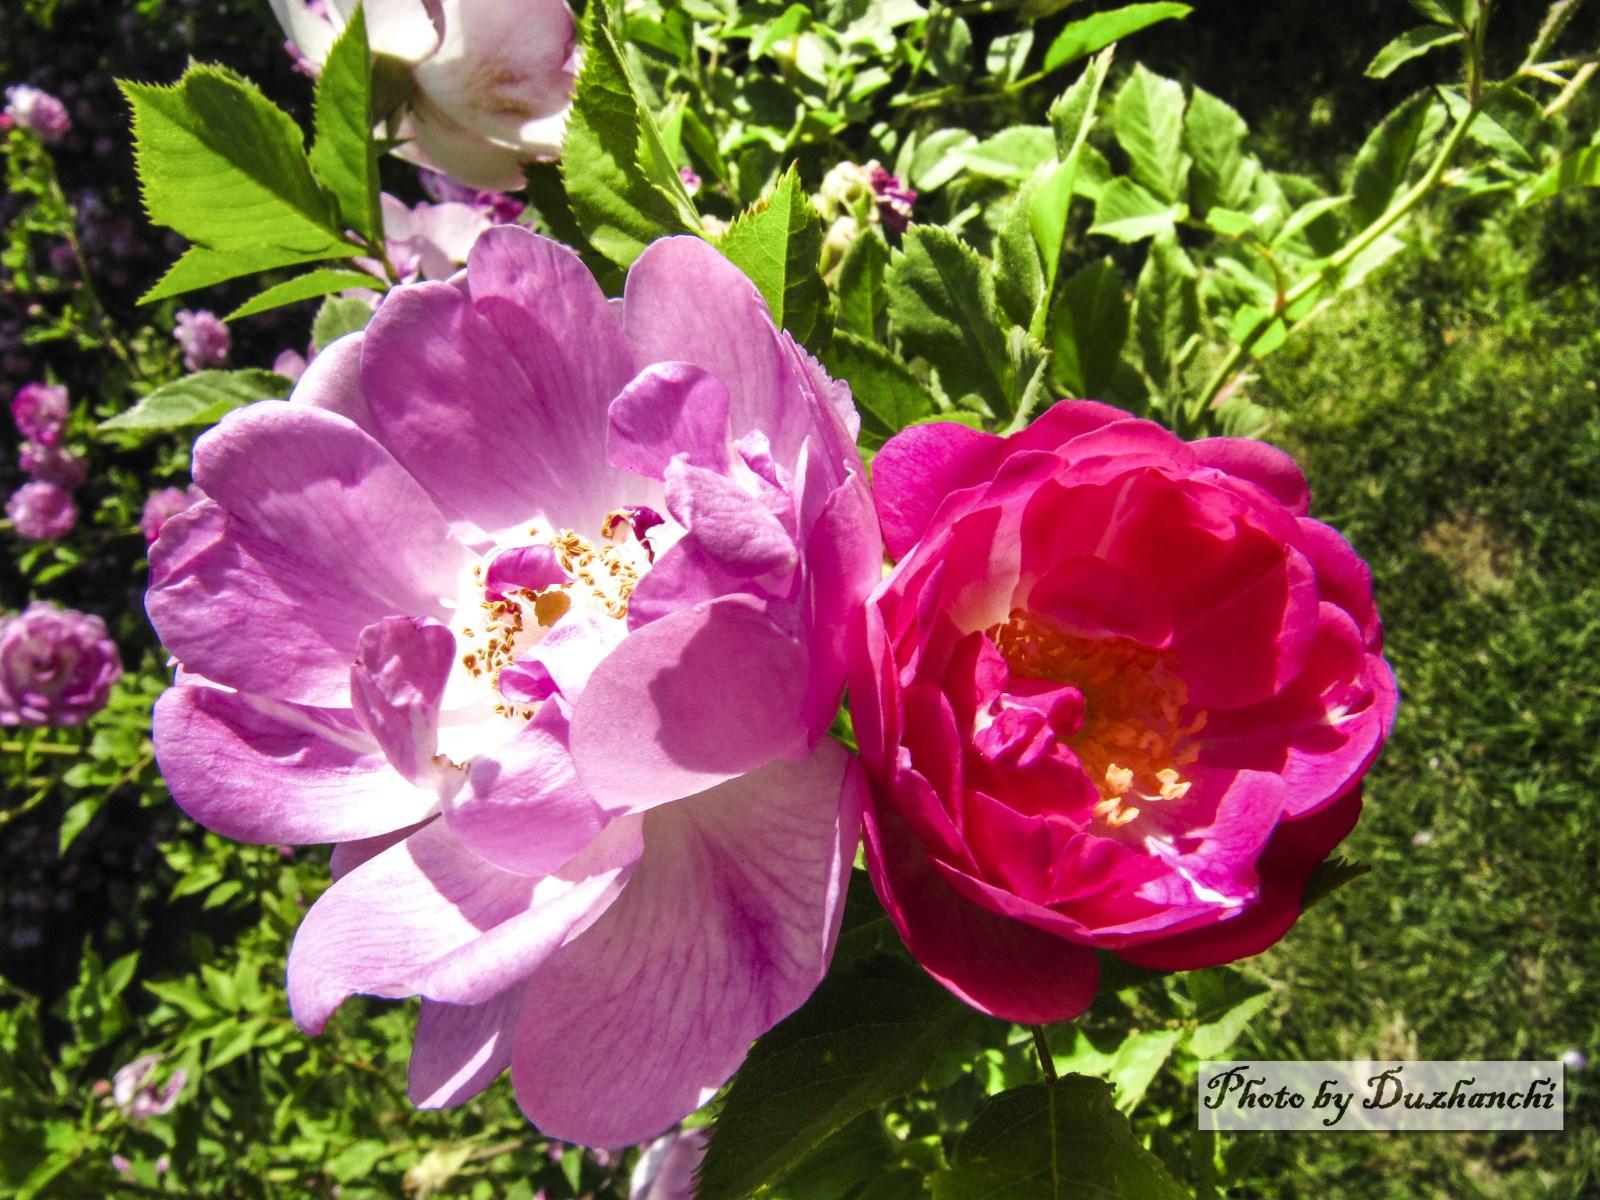 6IMG_6894玫瑰(北京植物园)_1水印.jpg